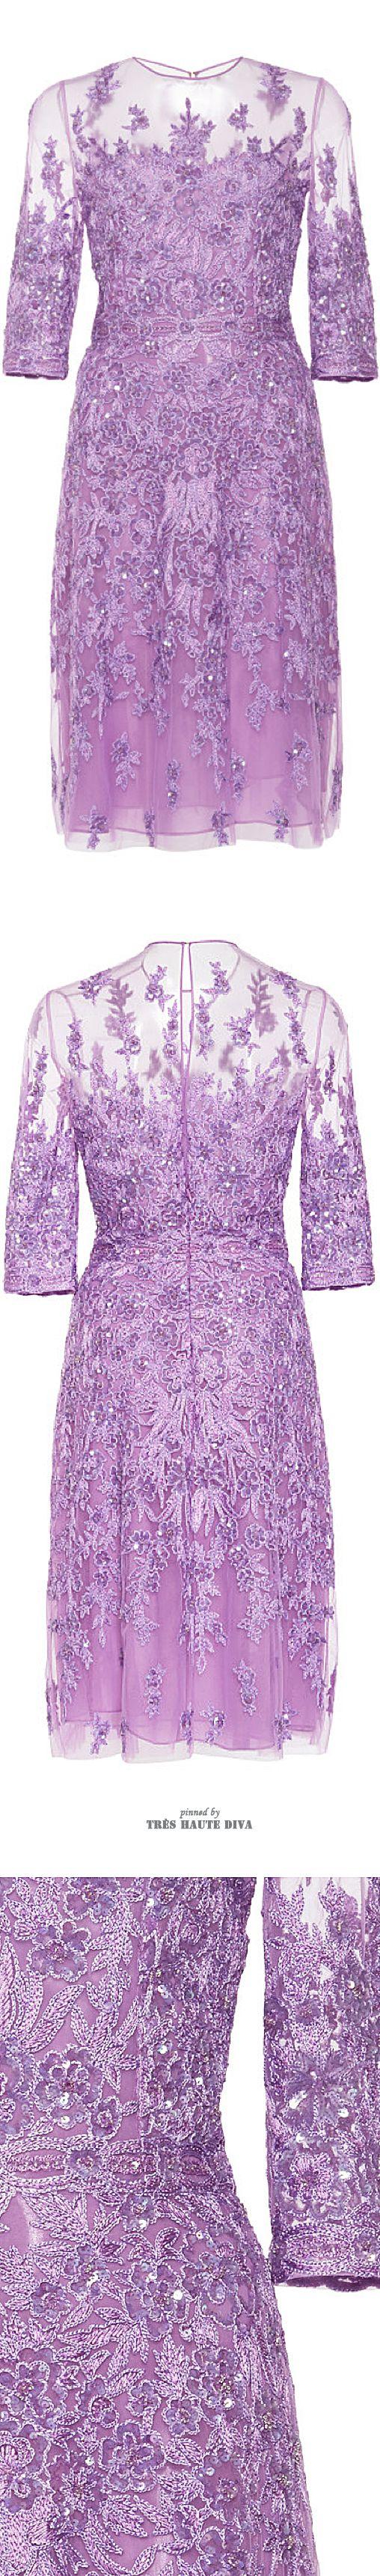 Naeem Khan Lace Embroidered Dress ♔ SS 2015